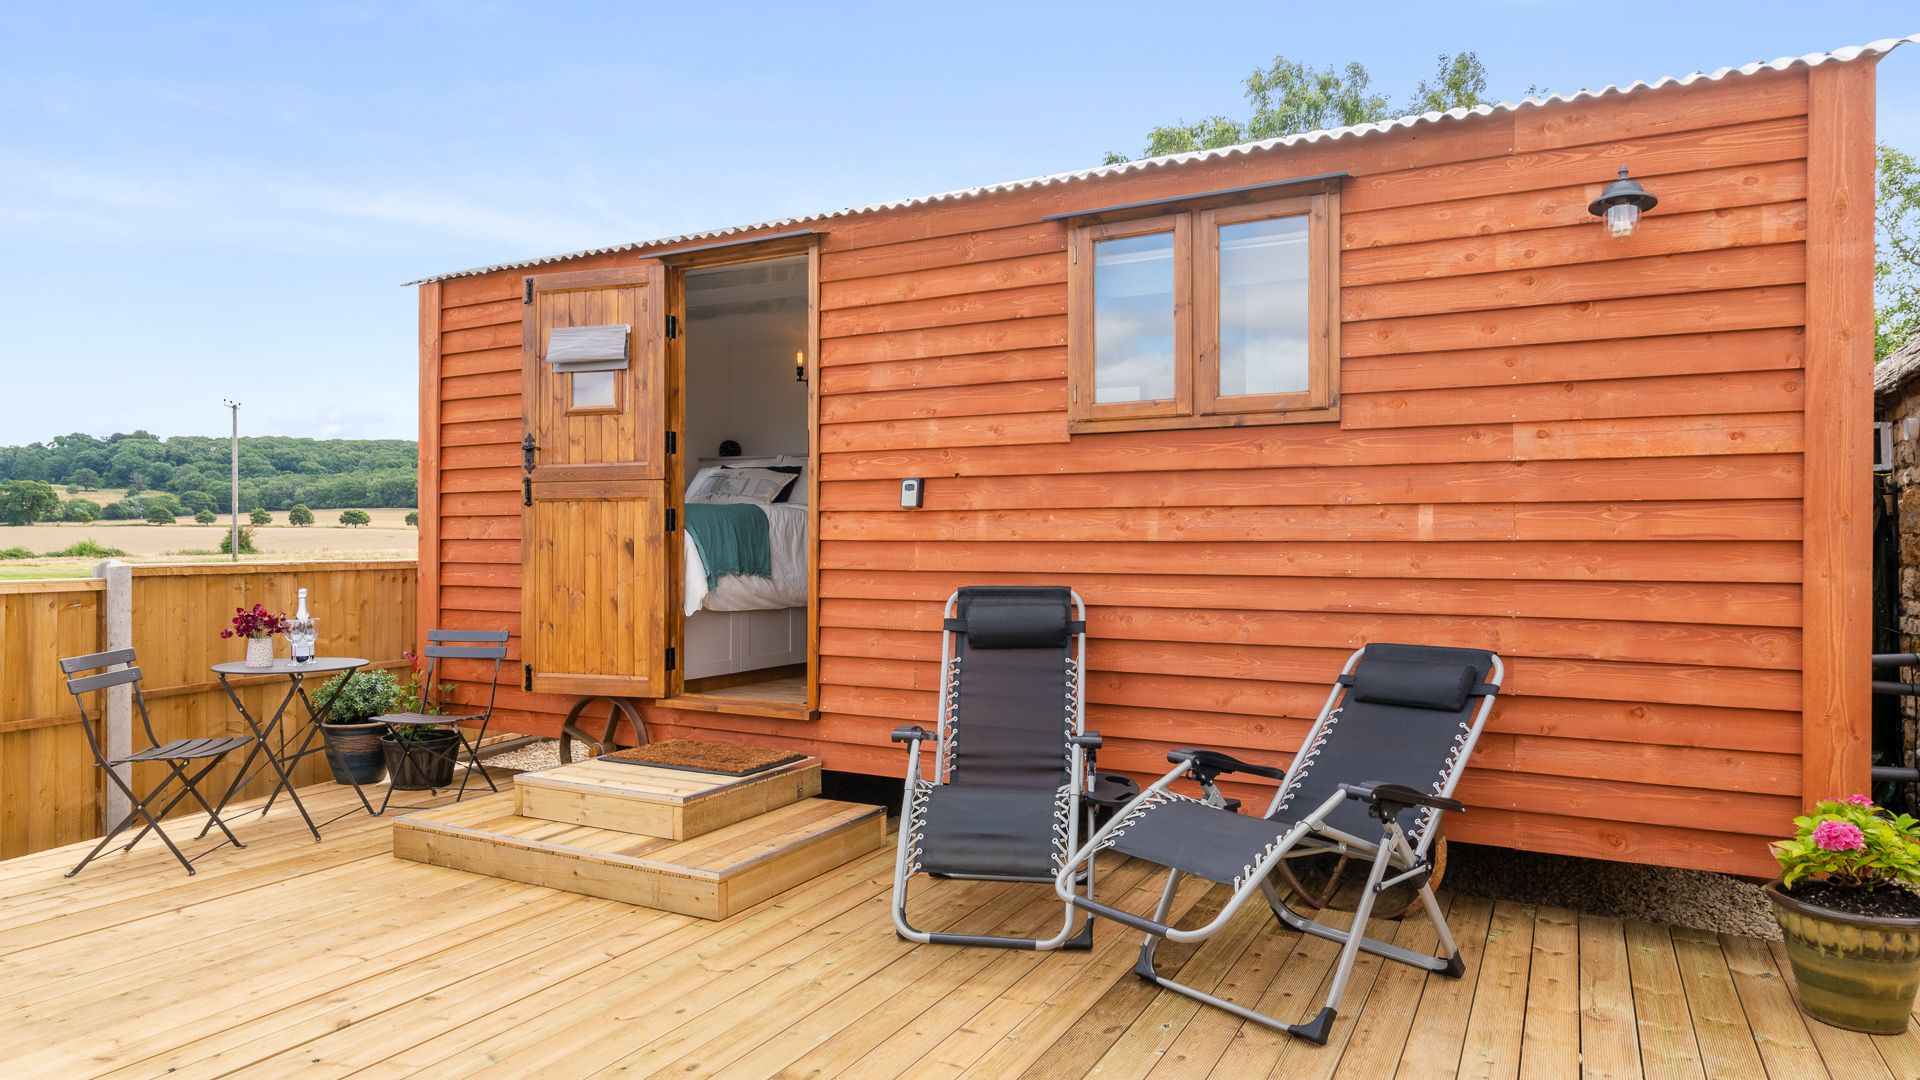 Exterior and Deck, Outbak Shepherds Hut, Bolthole Retreats